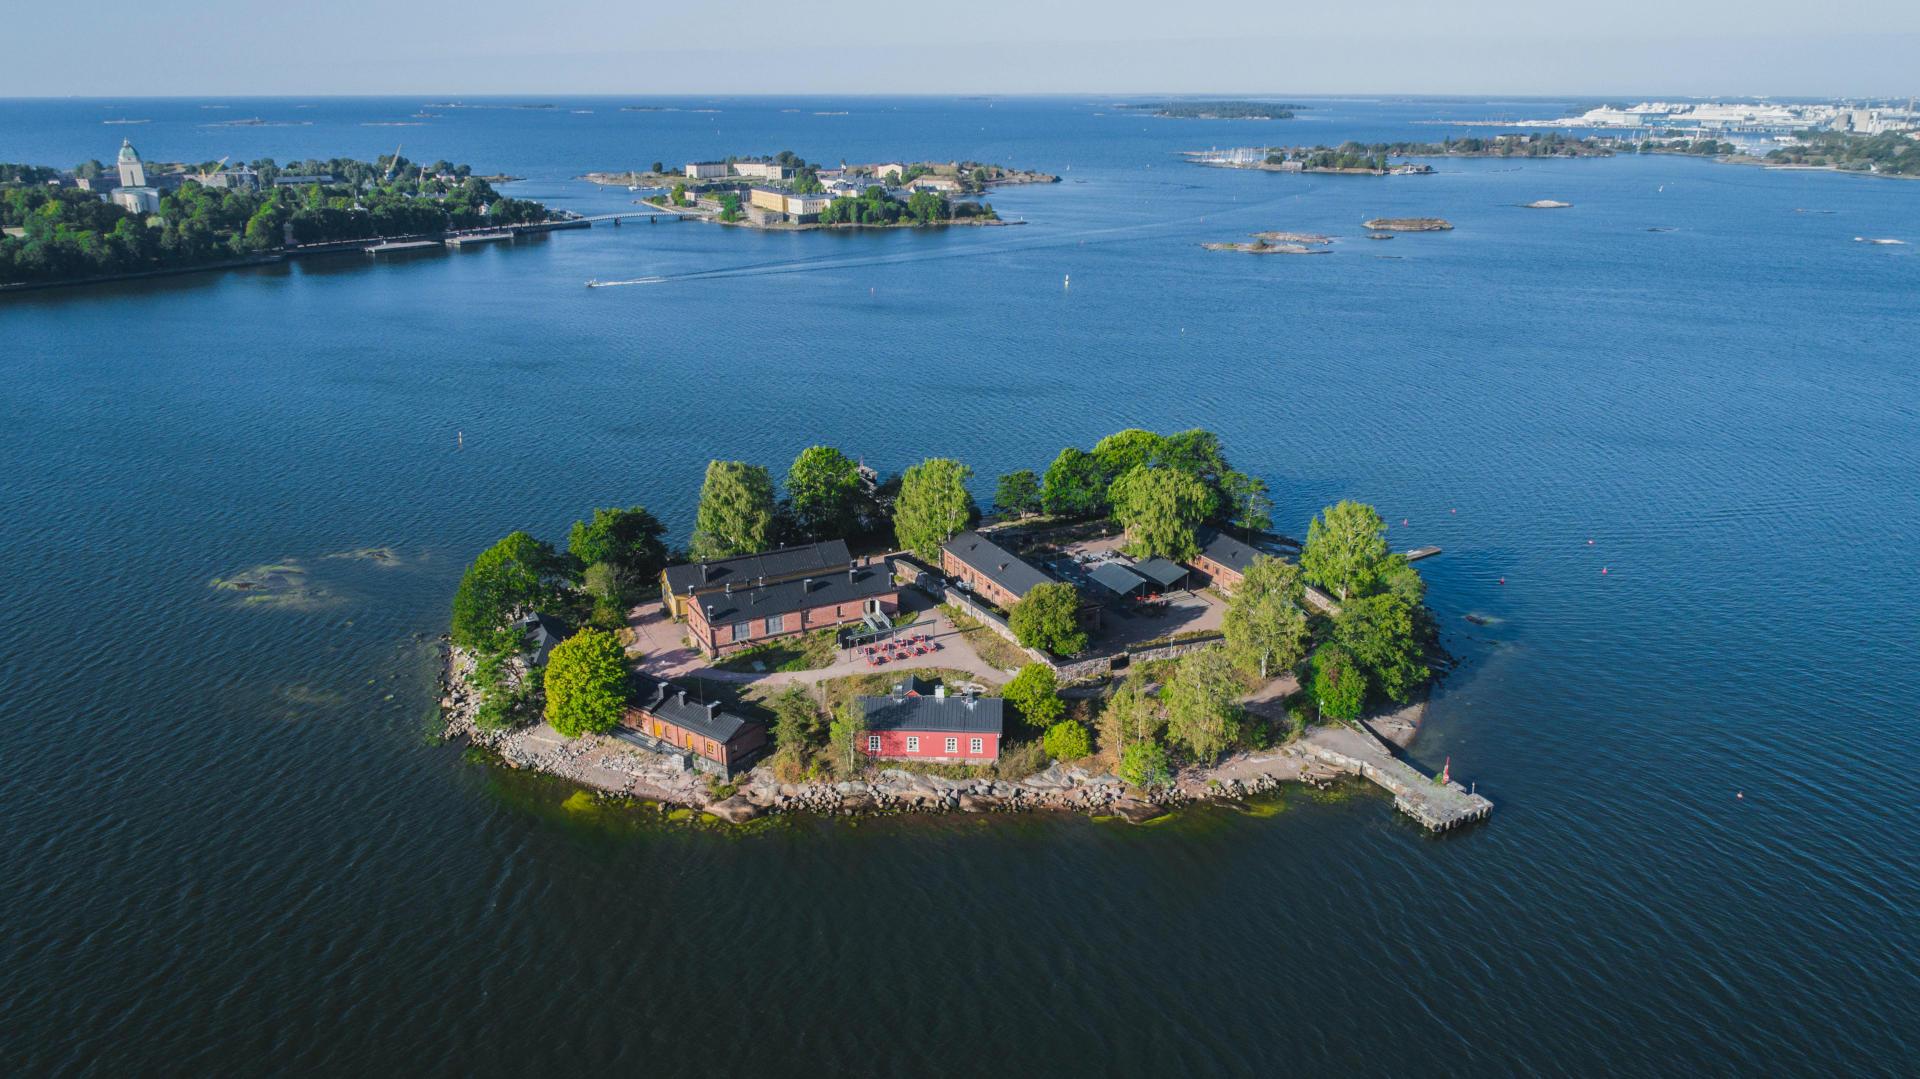 Lonnan saari Helsingin edustalla